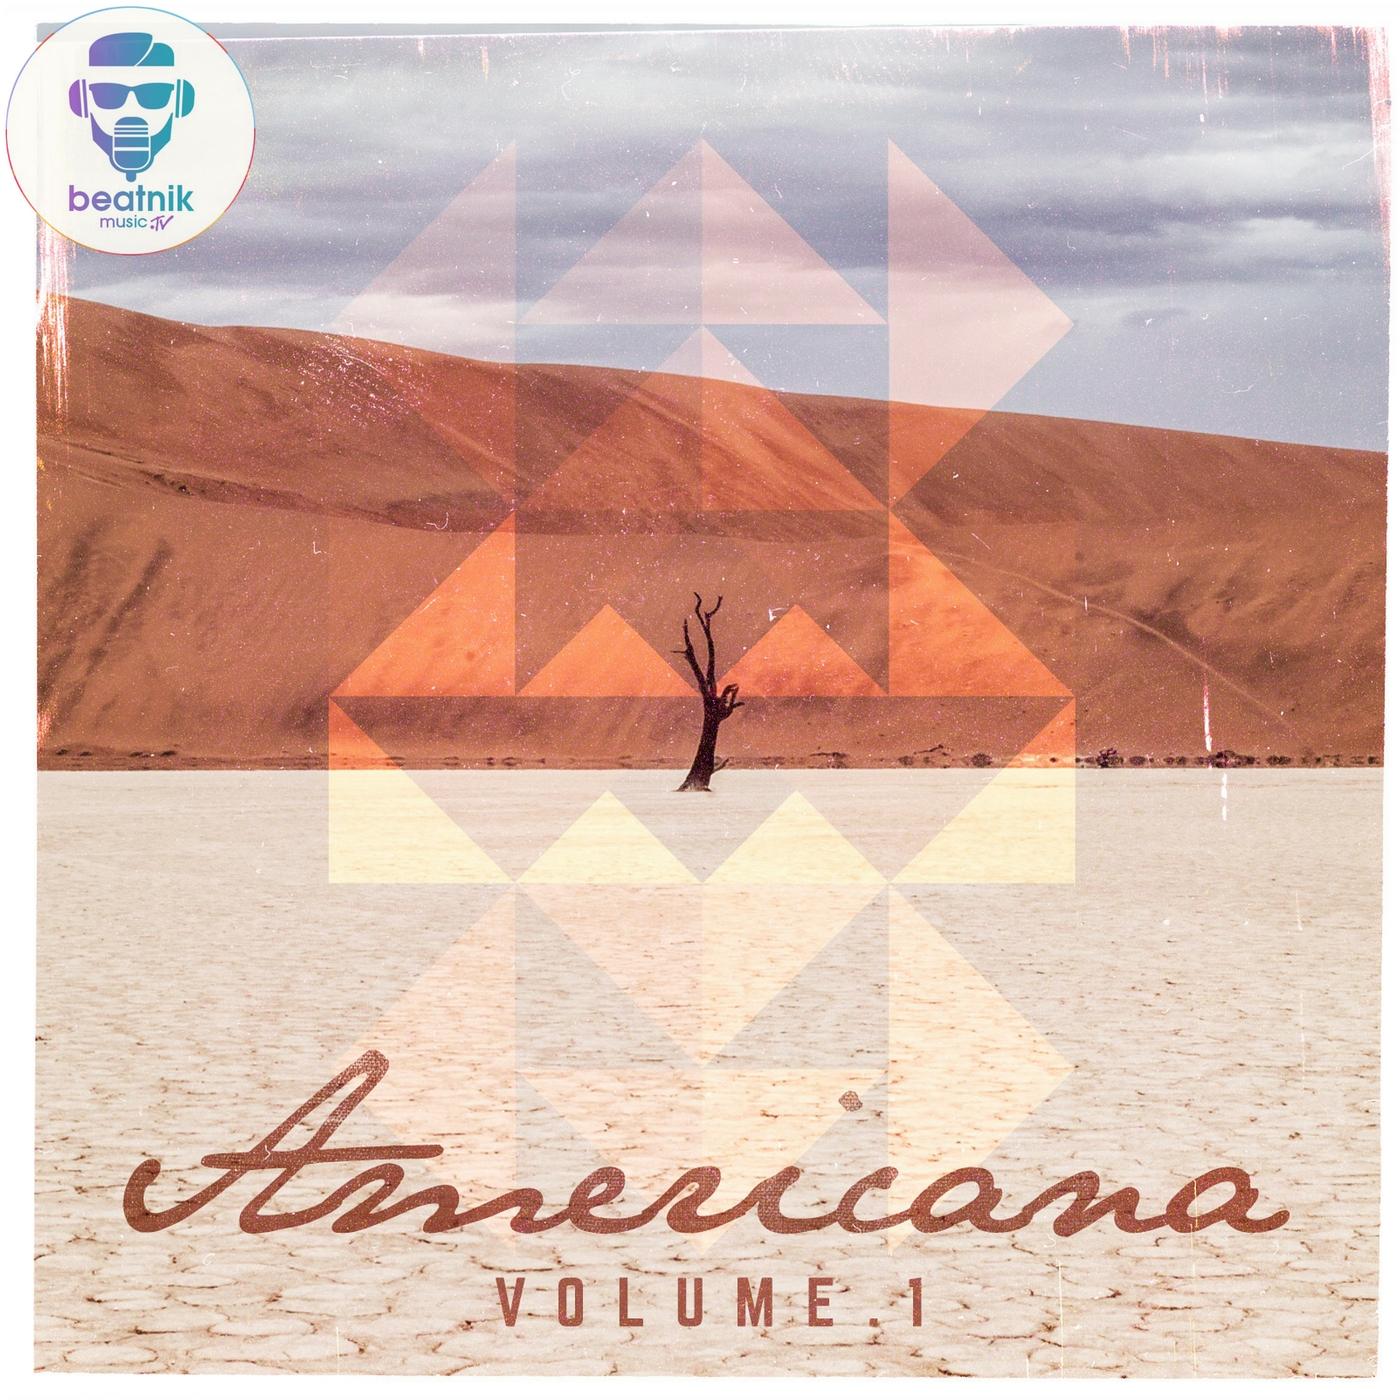 Americana - Vol. 1_cover.jpg